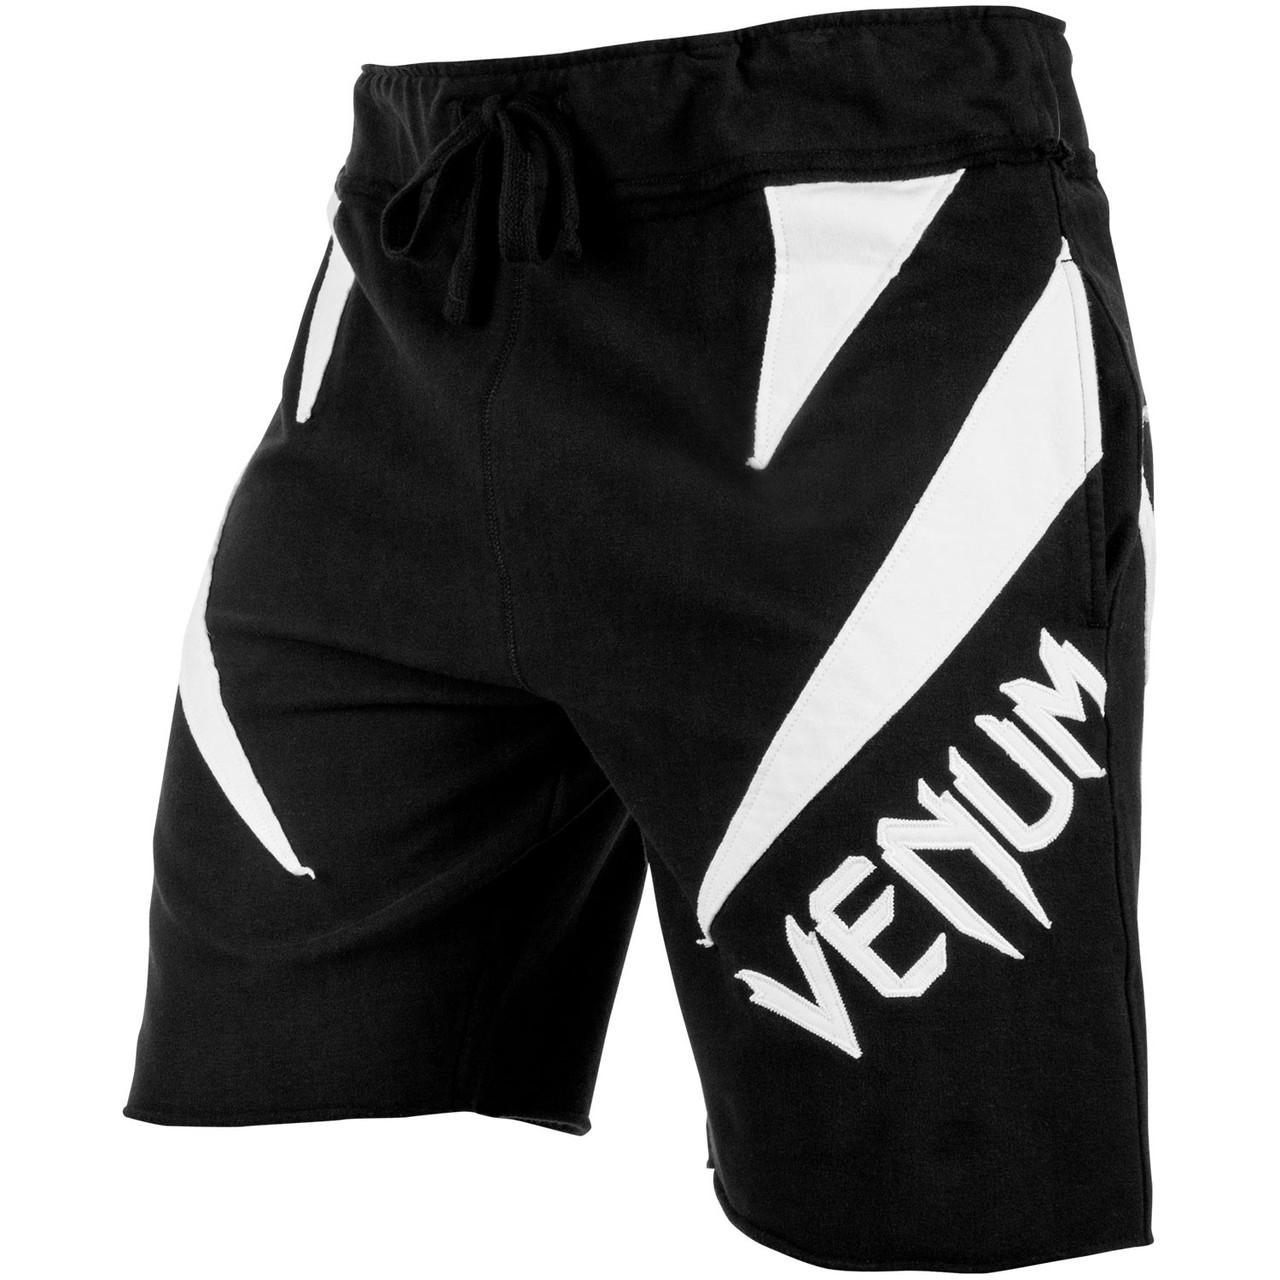 Шорты Venum Jaws Cotton Training Shorts Black White